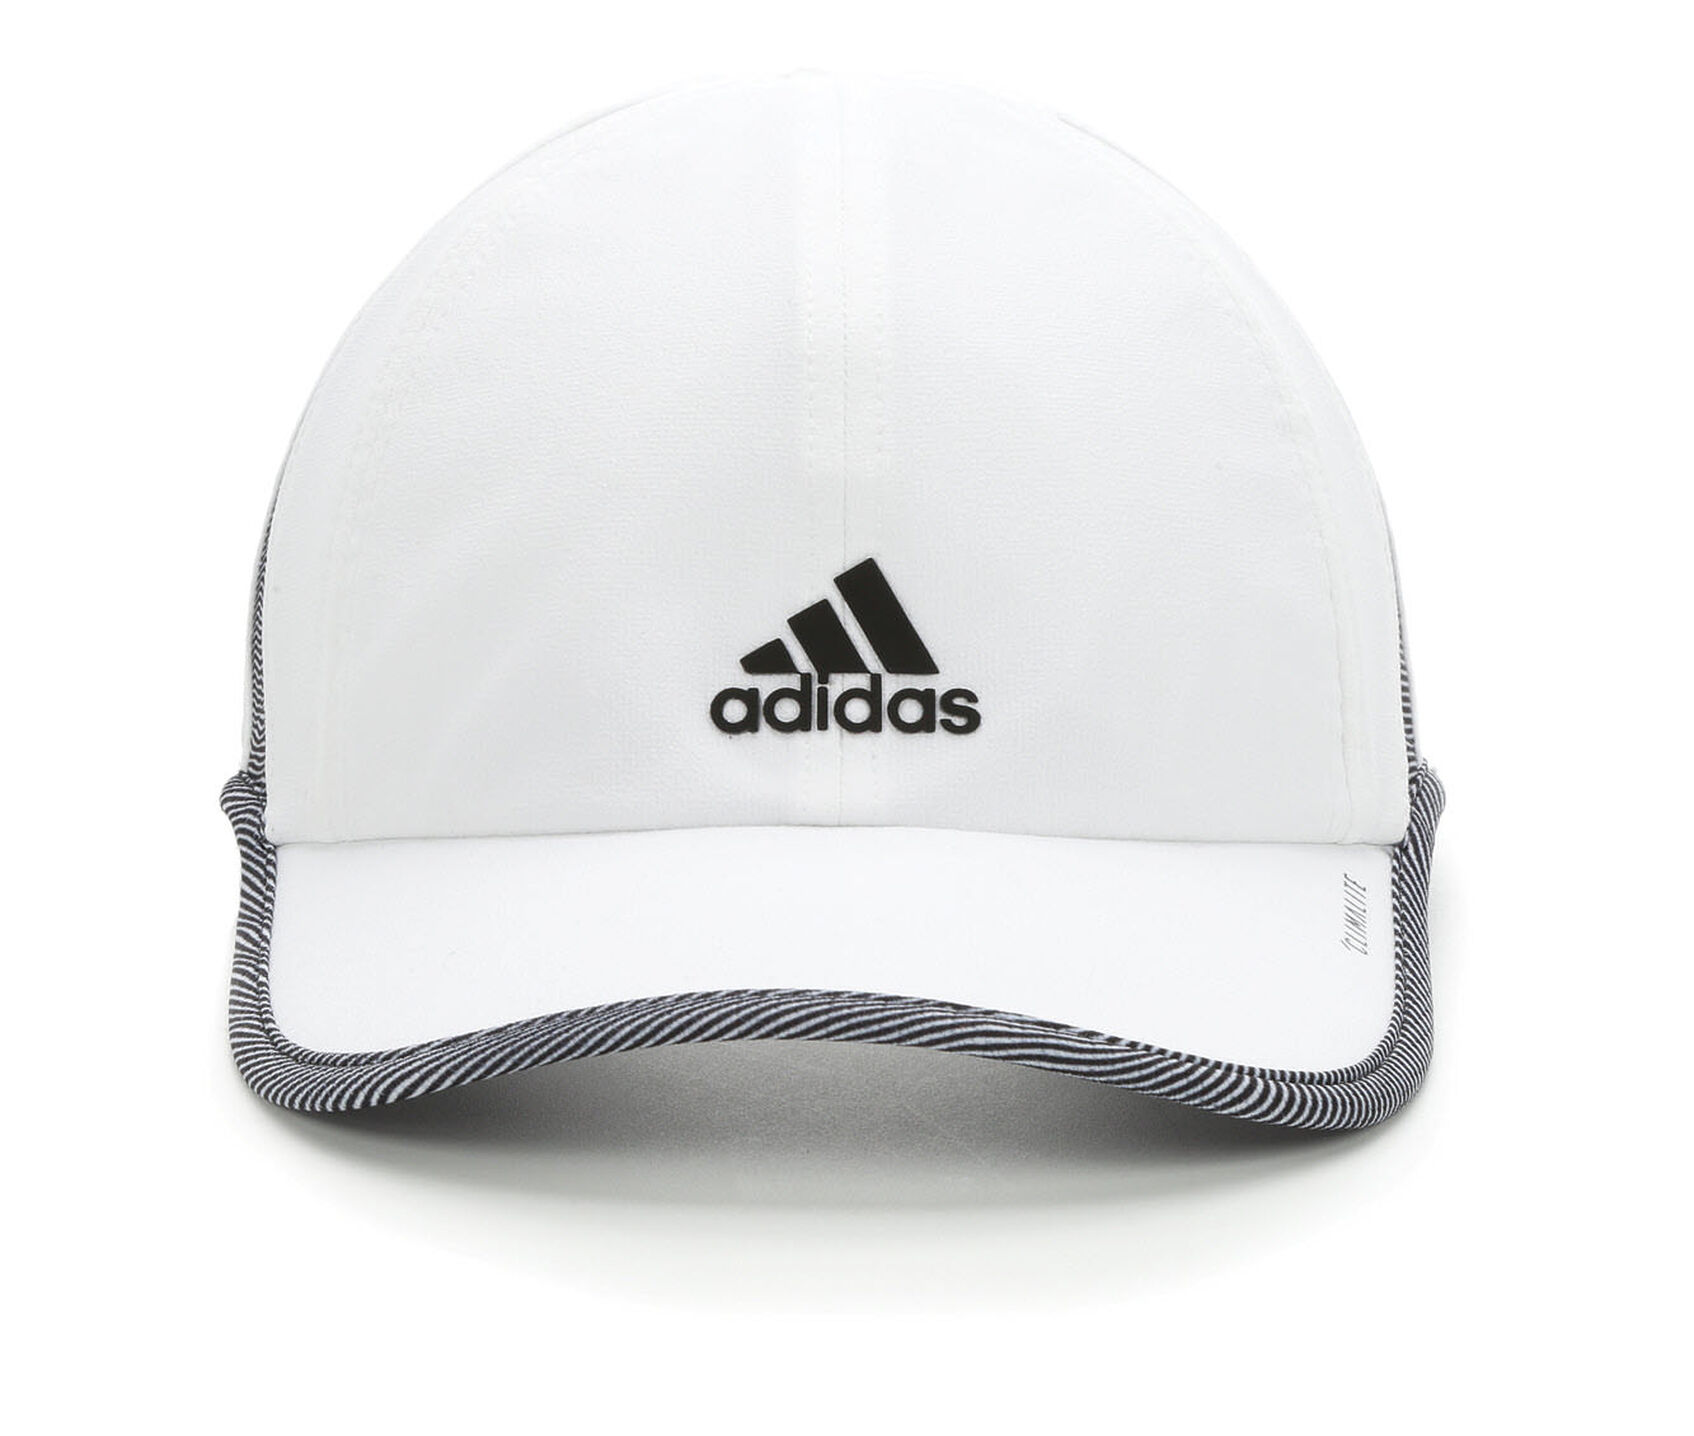 f78fc3fdc7a1f Adidas Womens Superlite Adjustable Cap. Previous